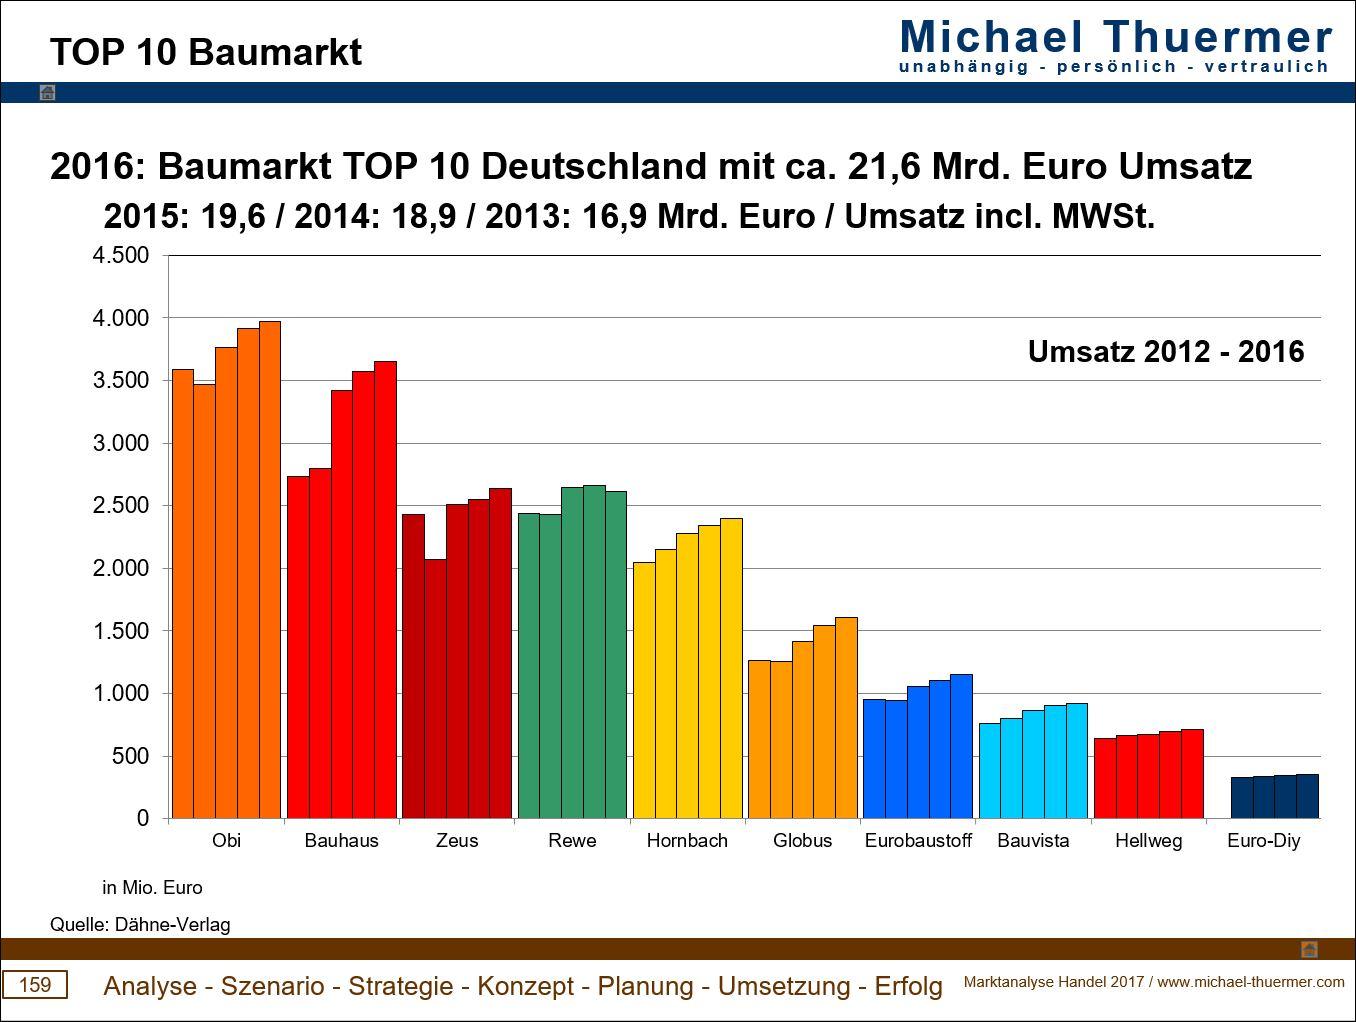 Zukunft Holz Michael Thuermer Informationen Anregung Bildung